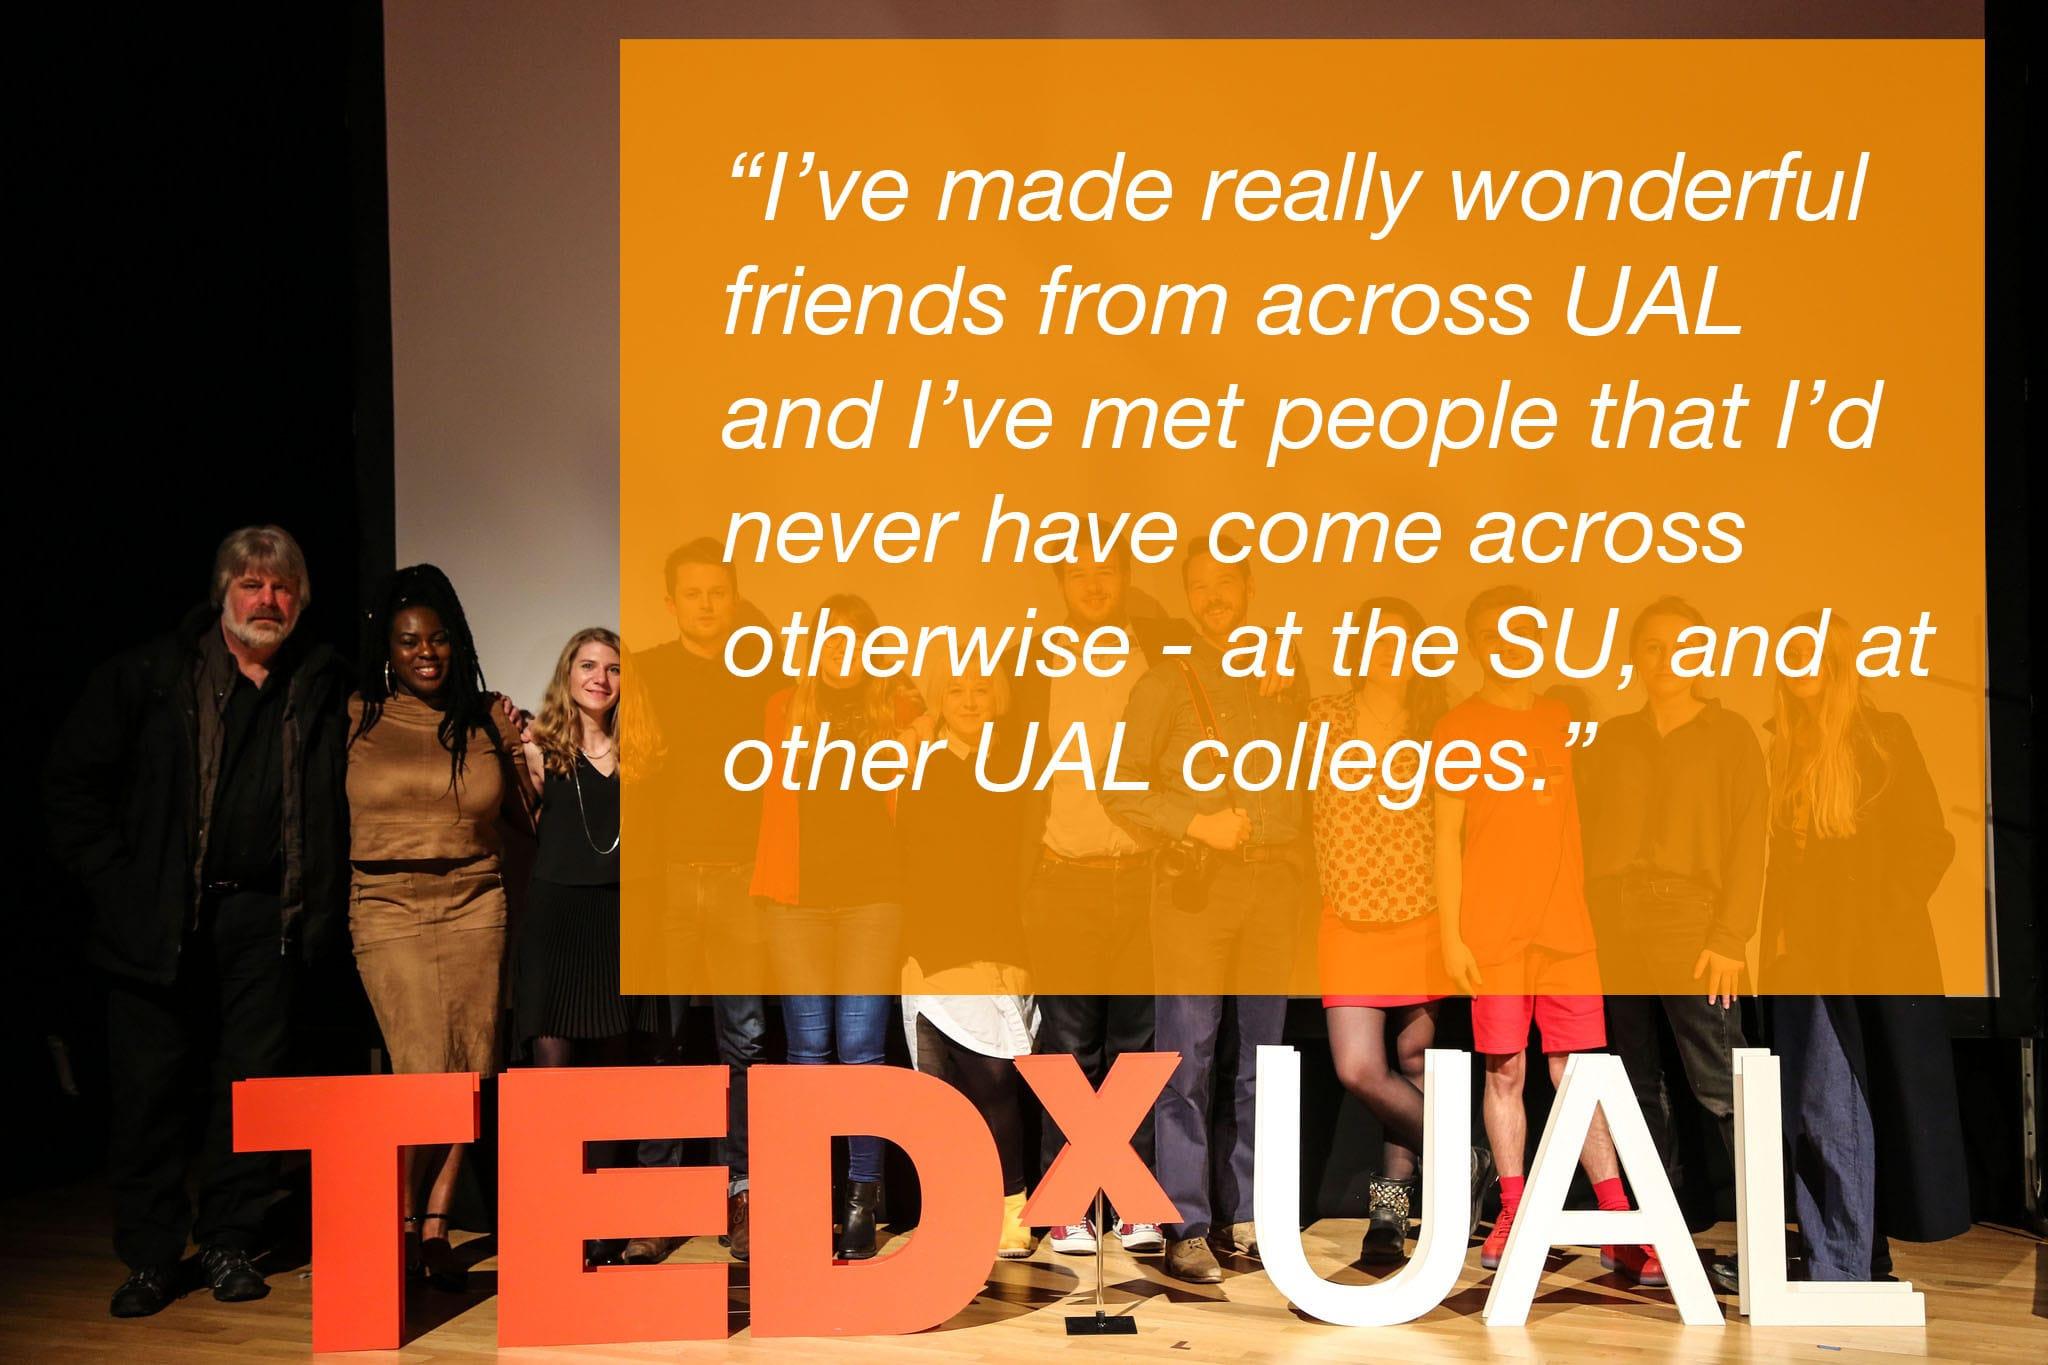 TEDxUAL